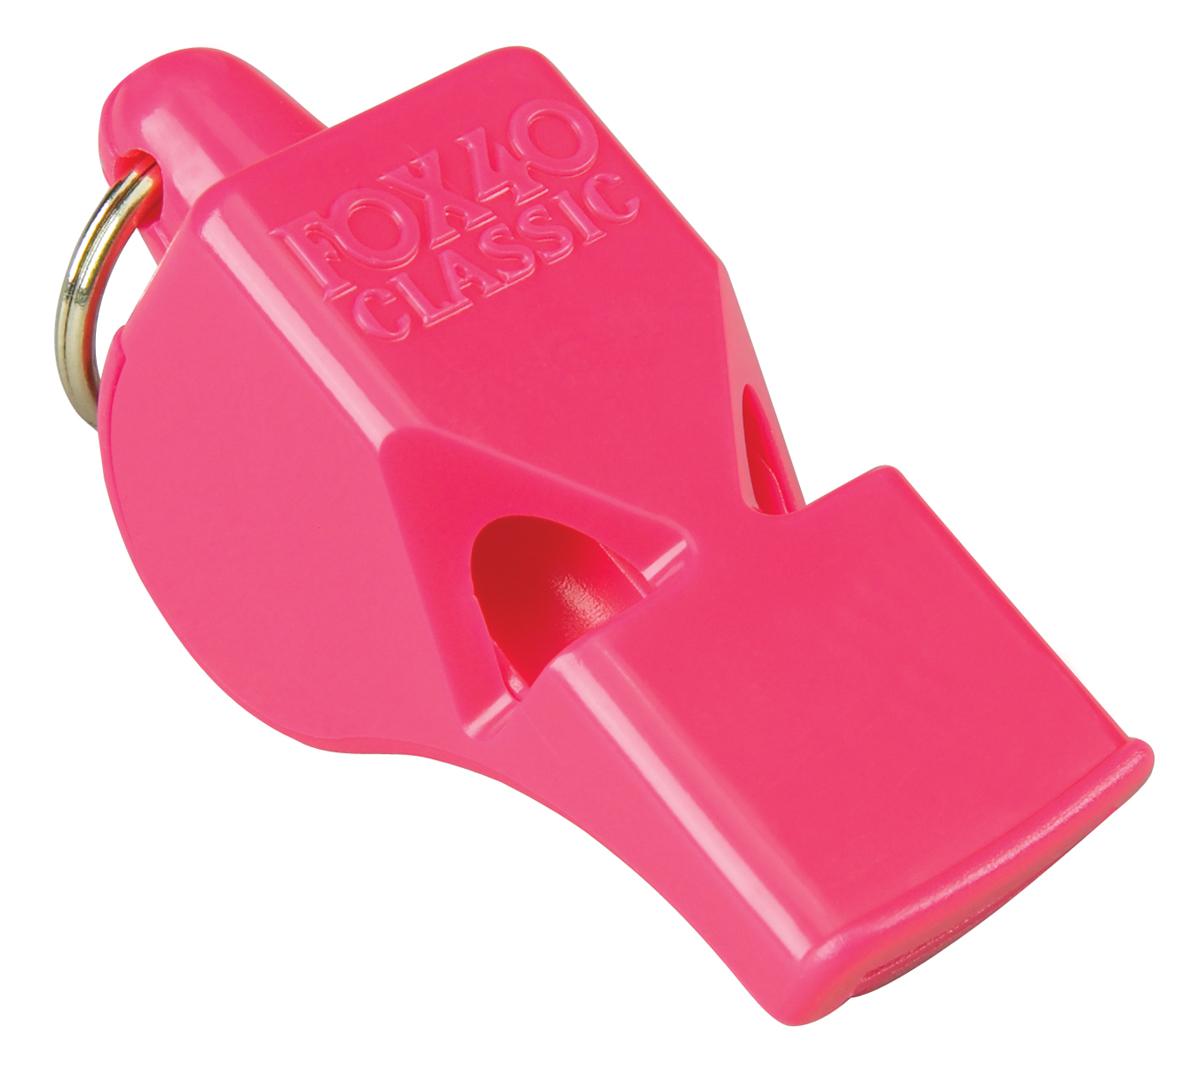 dc1e98a6a03d Tutto Fox 40 Whistles Pink Prodotto